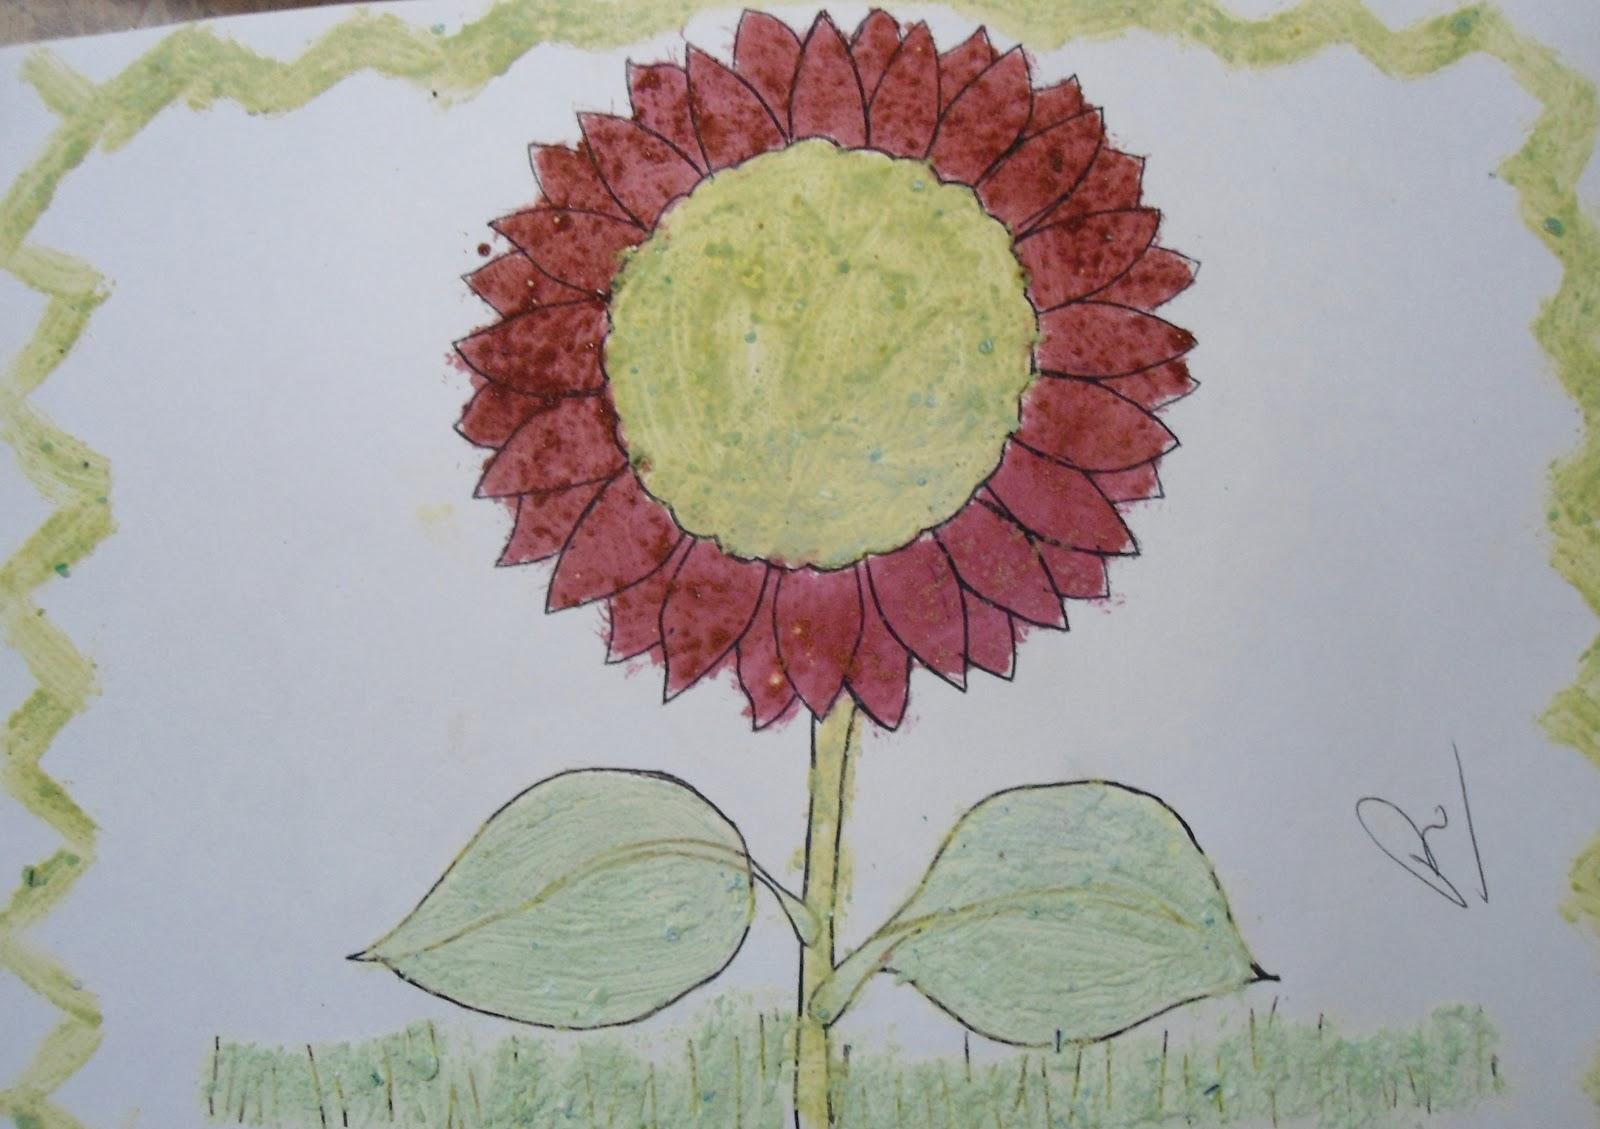 Tecnica preescolar tecnica para colorear - Como decorar un dibujo ...